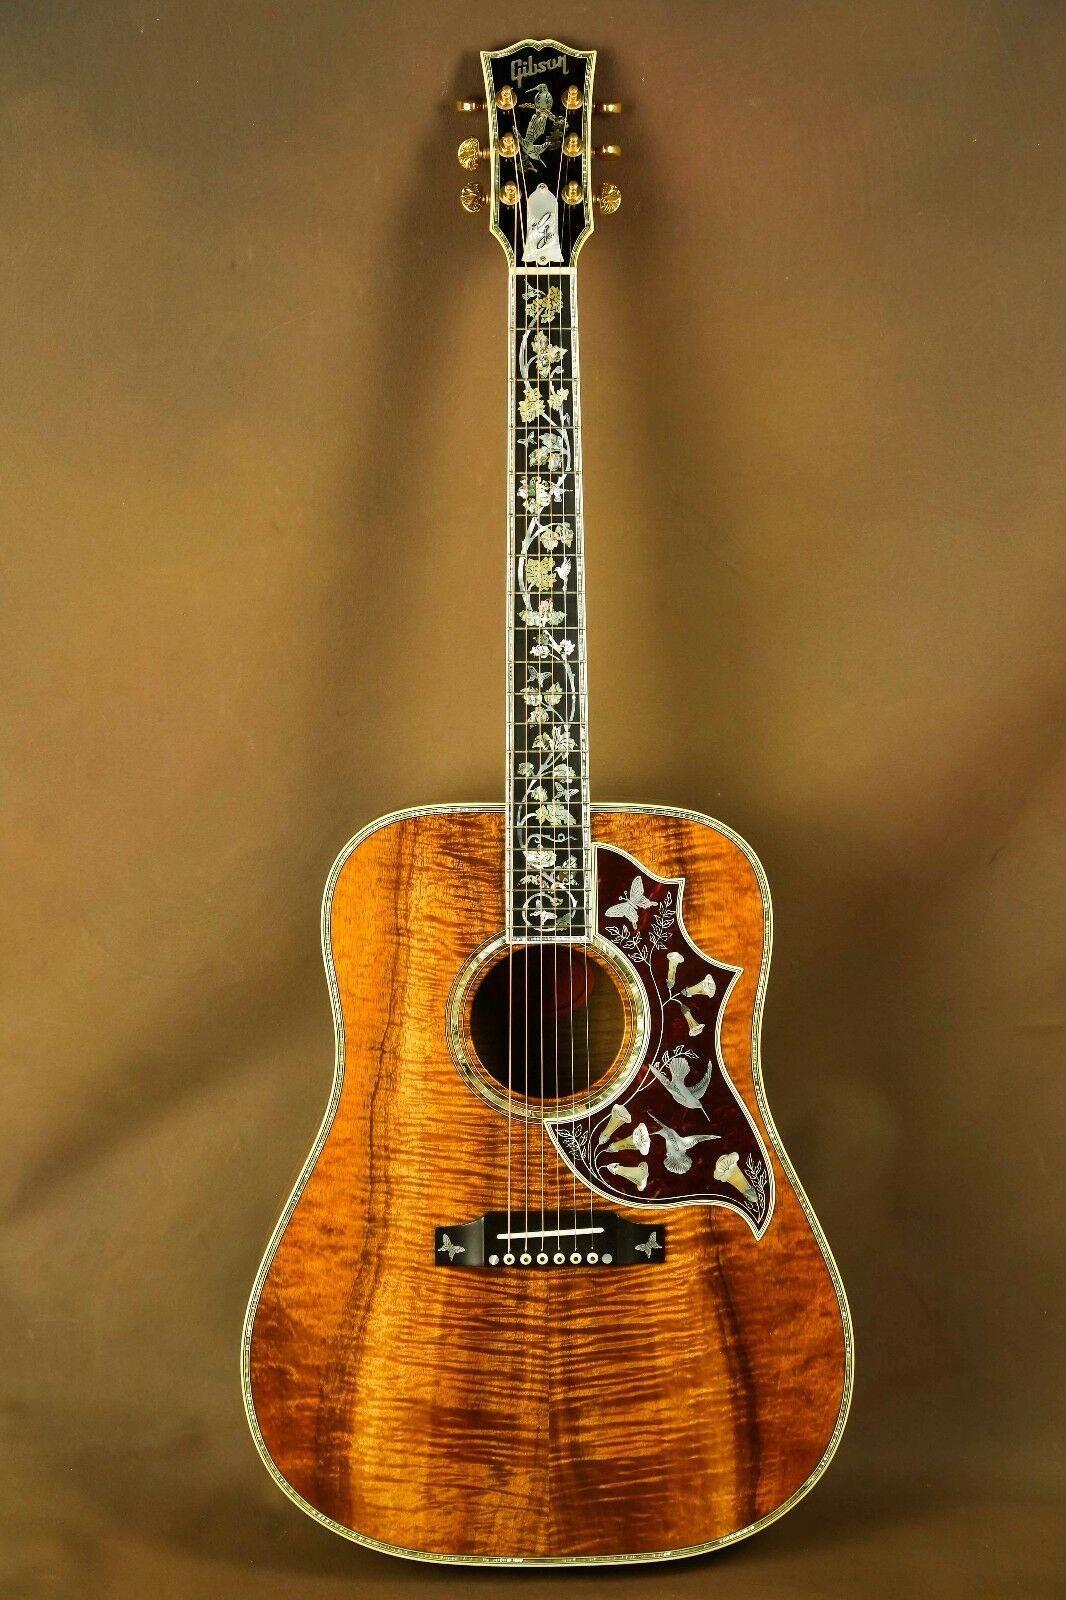 27 Excellent Electric Guitar Nut Files Electric Guitar Gig Bag Jackson Guitarlegen In 2020 Custom Acoustic Guitars Acoustic Guitar Photography Gibson Guitars Acoustic